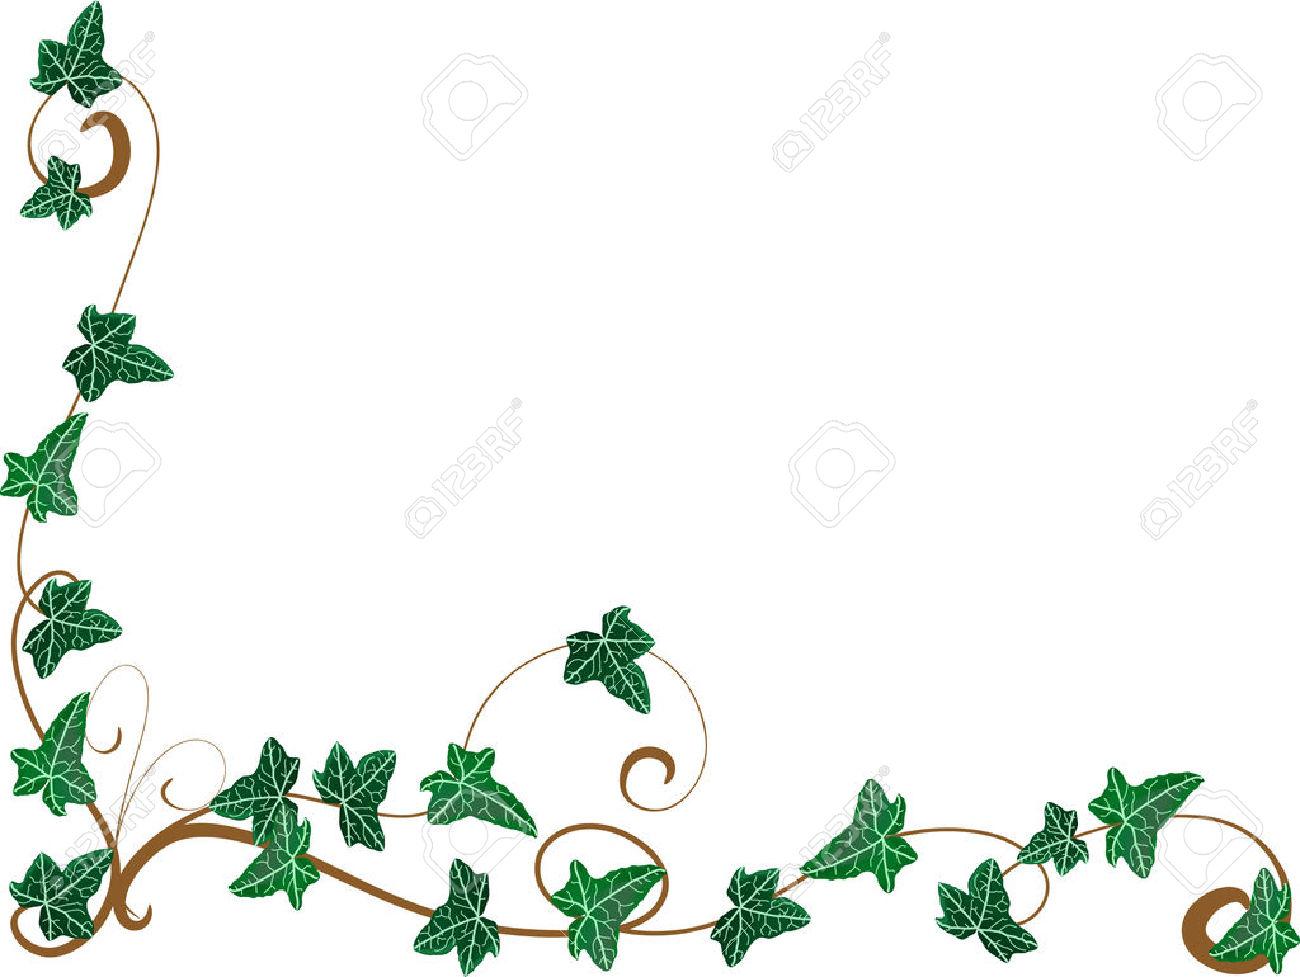 Ivy clipart design. Free download best on